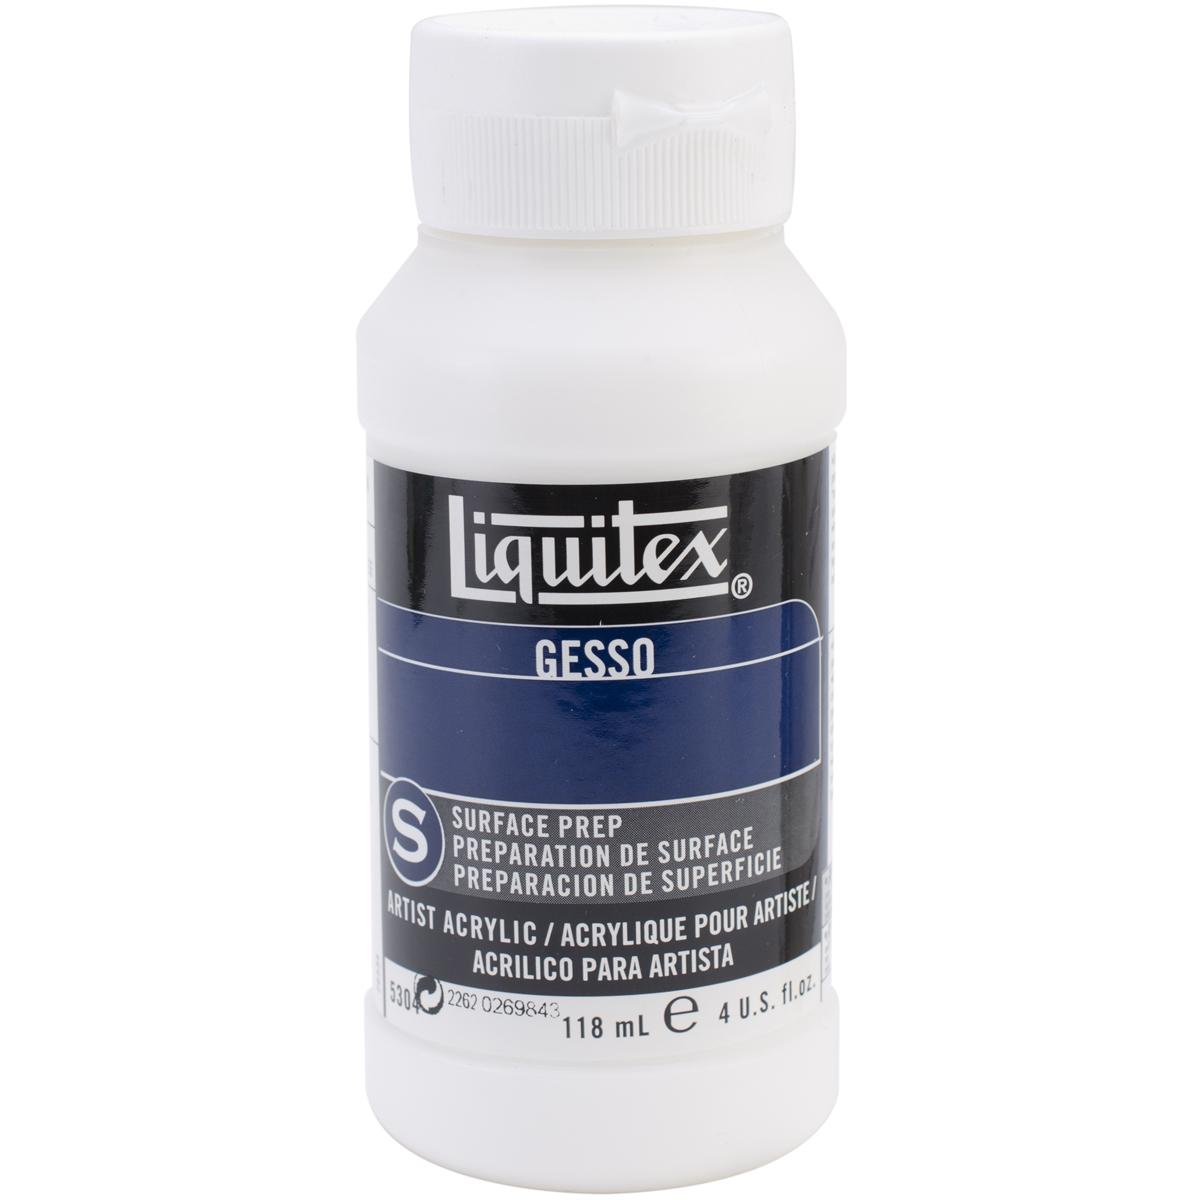 Liquitex Acrylic Gesso Surface Prep-White 4oz